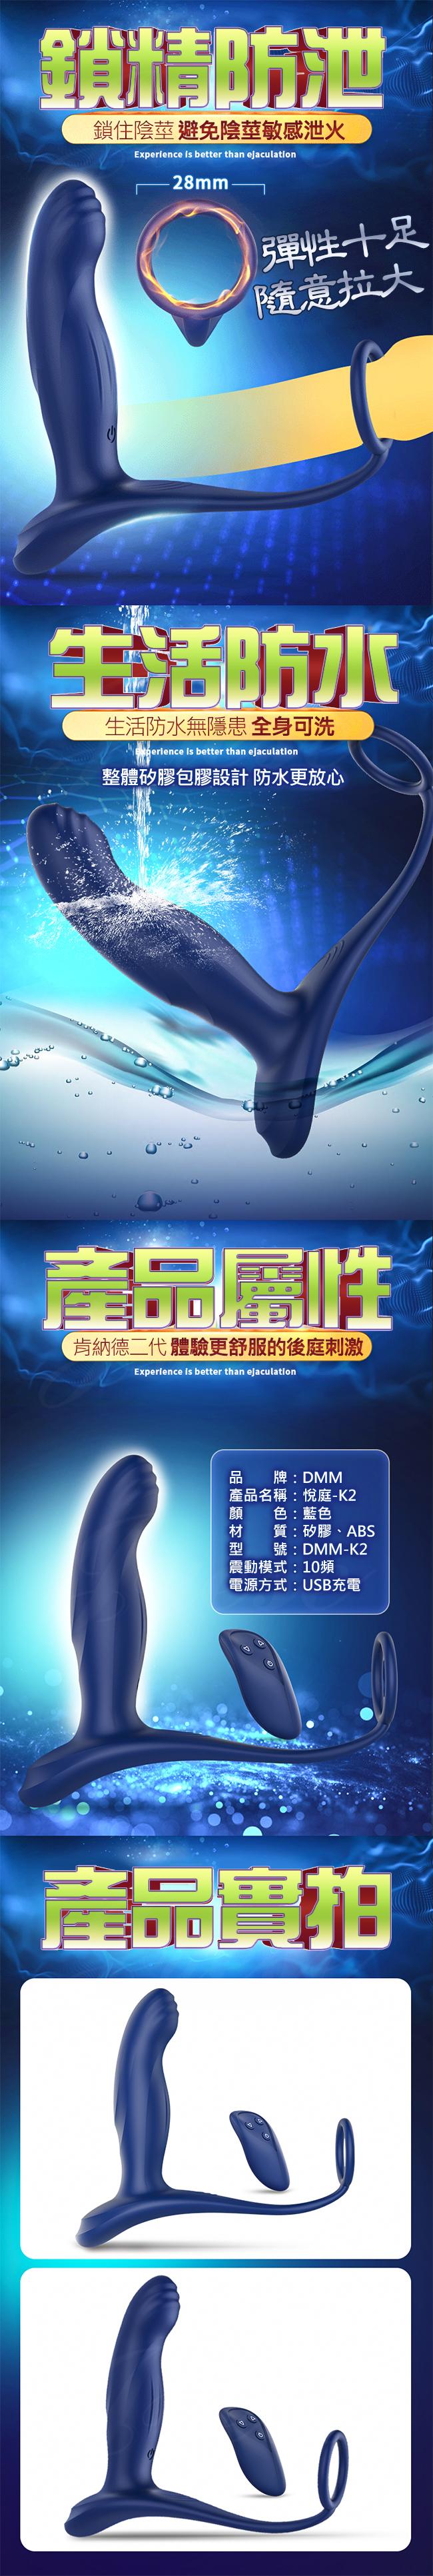 DMM-肯納德二代 10段變頻無線遙控鎖精震動矽膠後庭棒